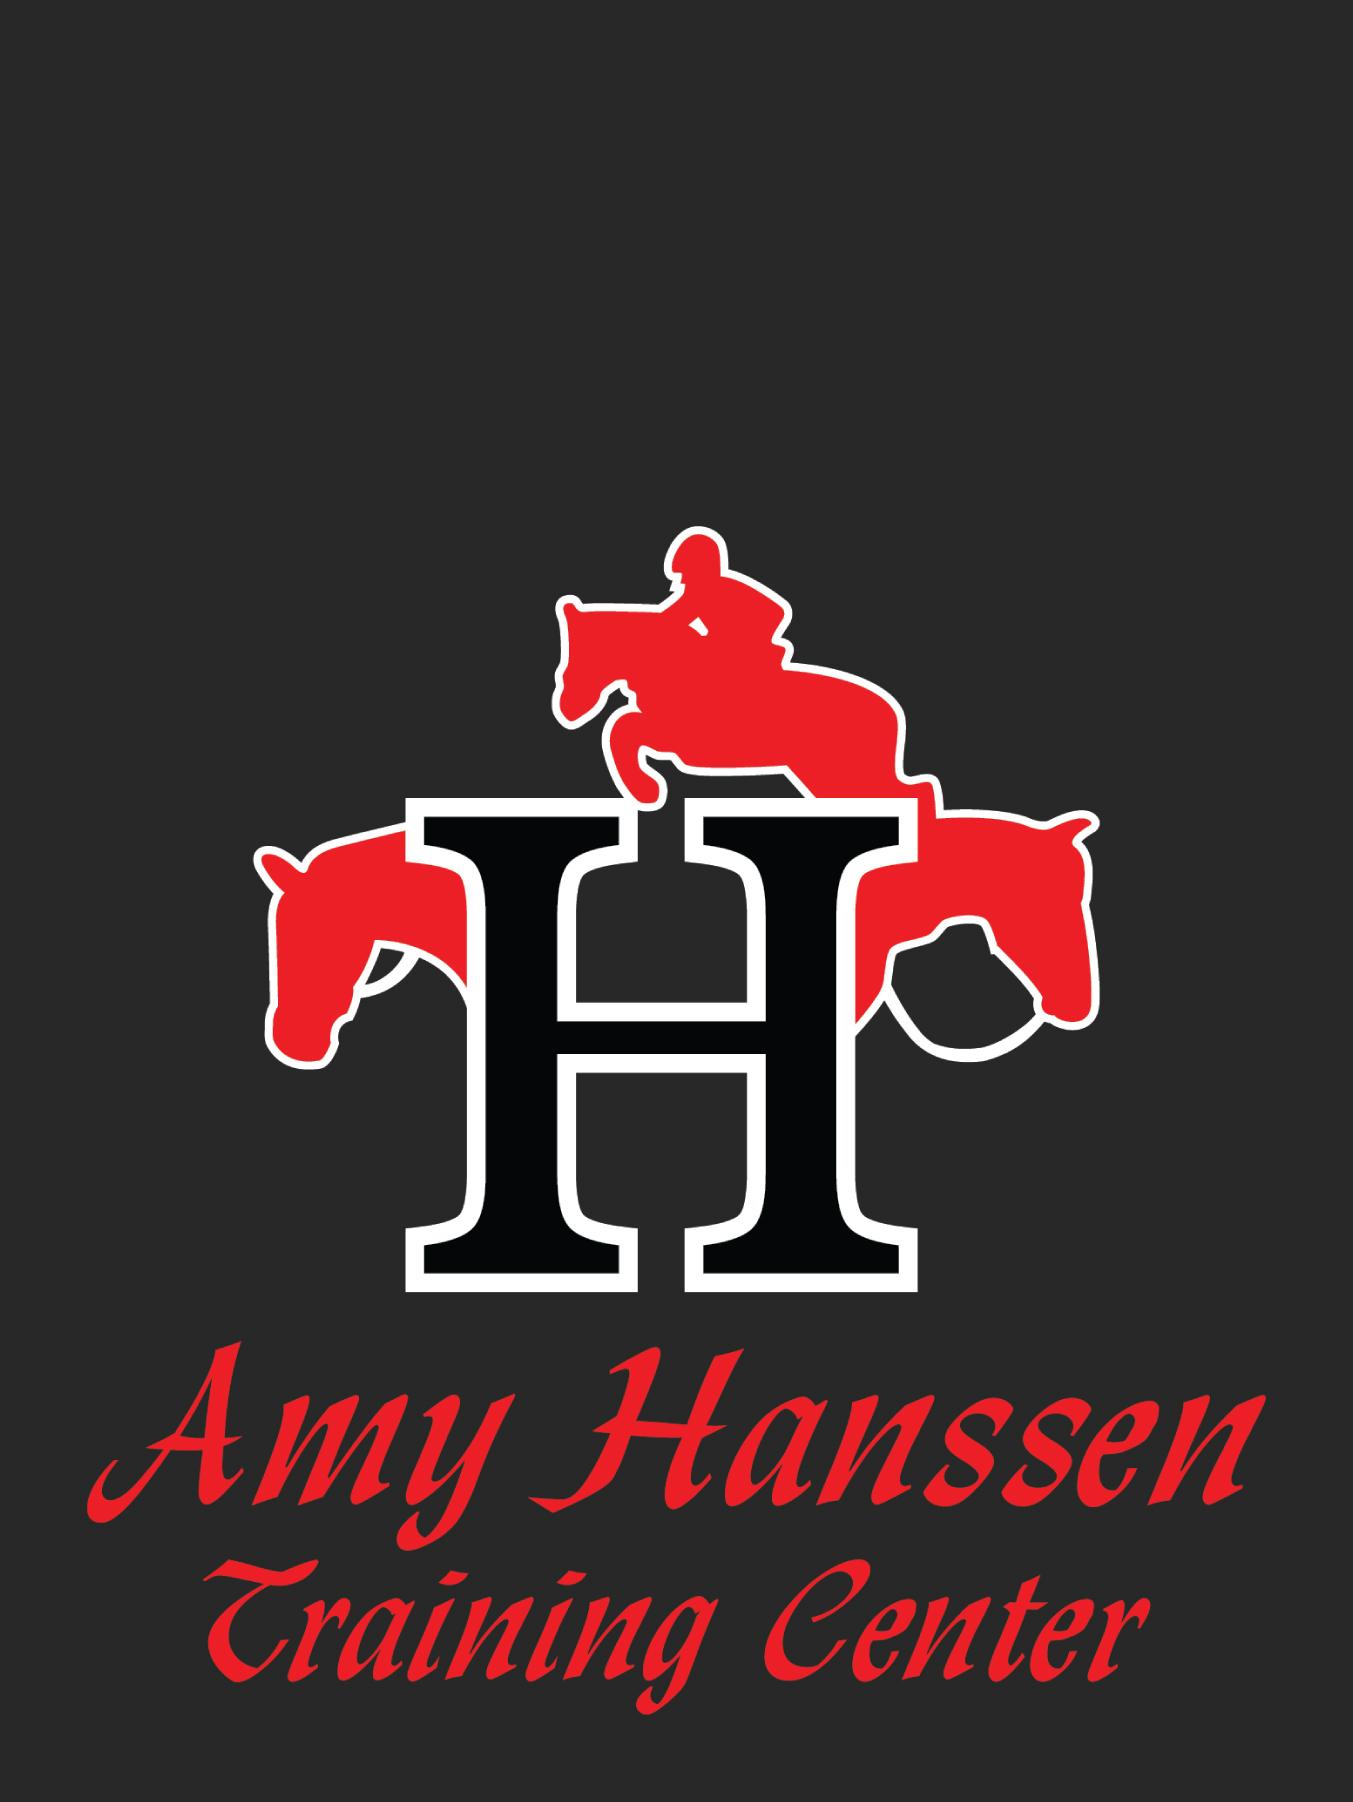 Amy Hanssen Training Center